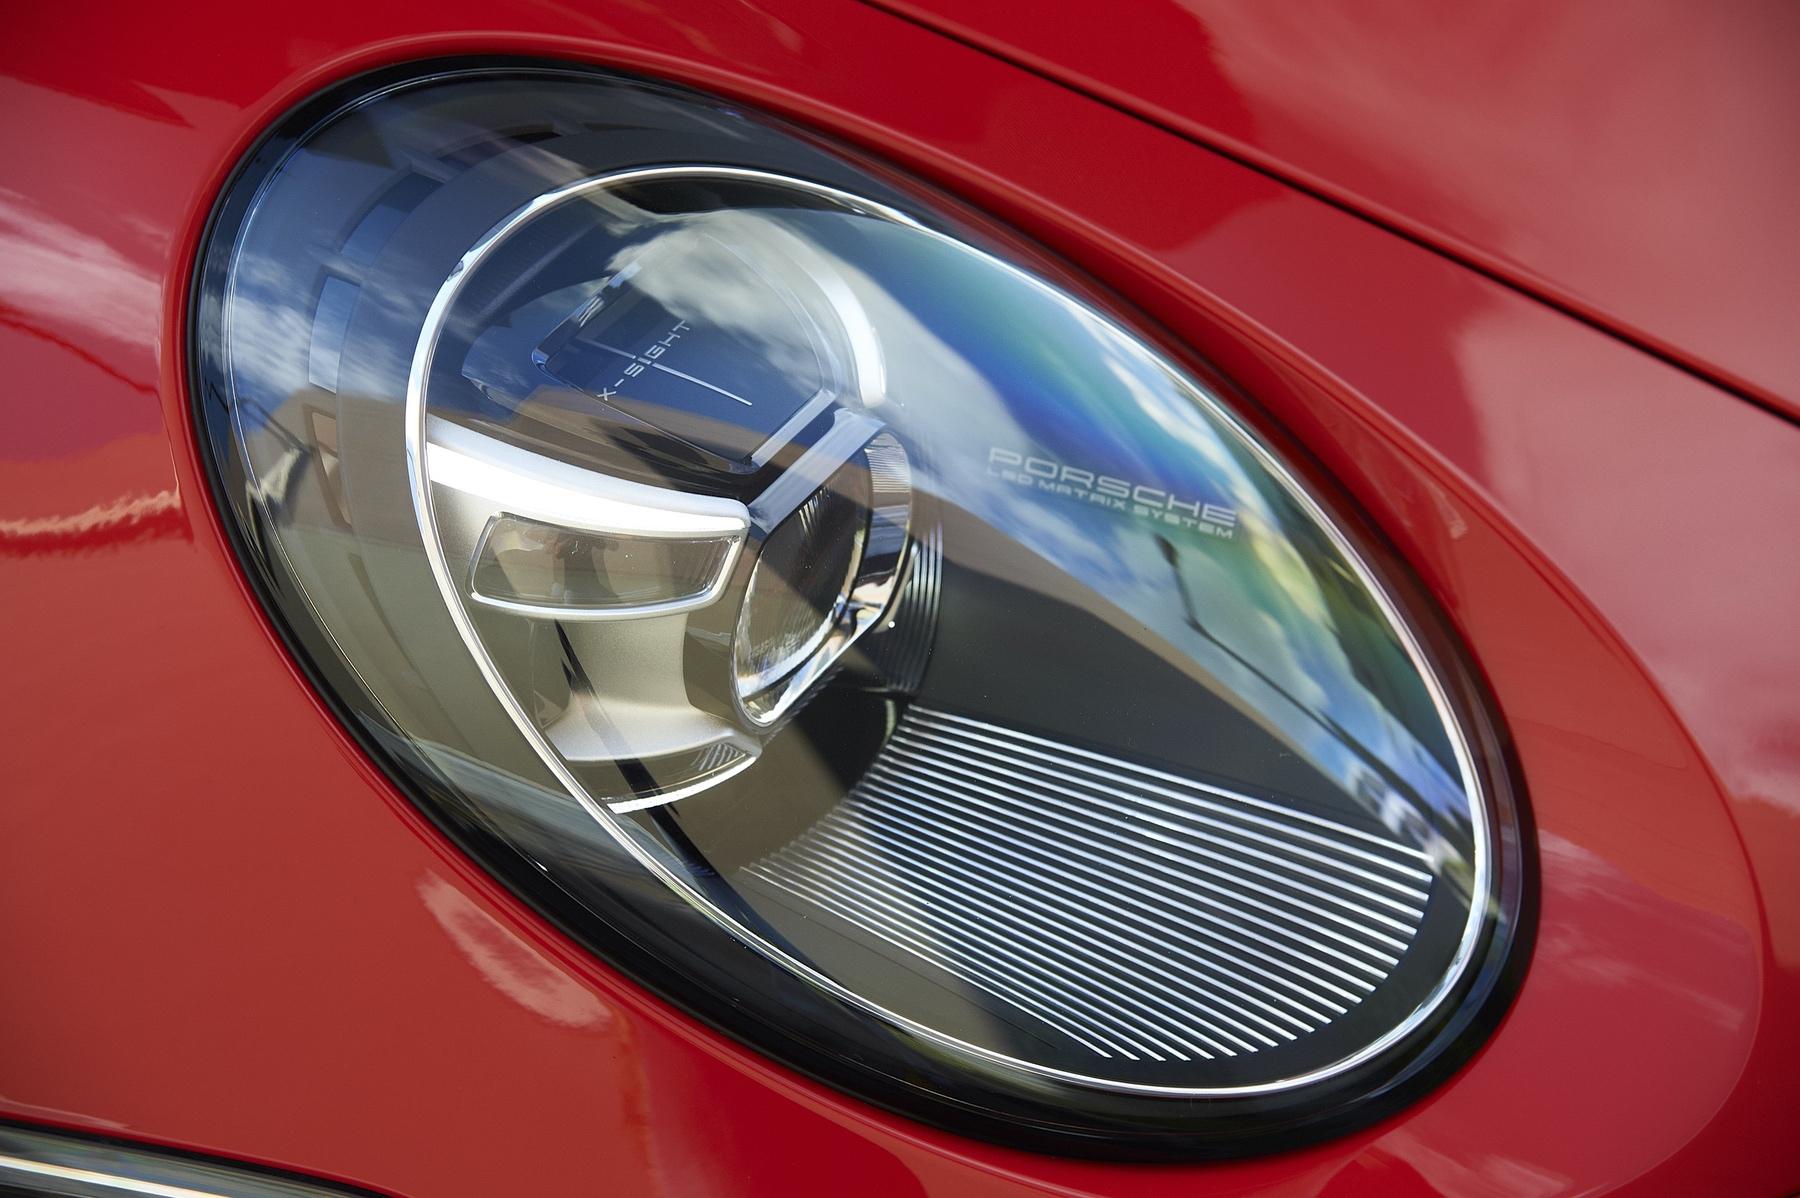 Test_Drive_Porsche_911_Athens_0161